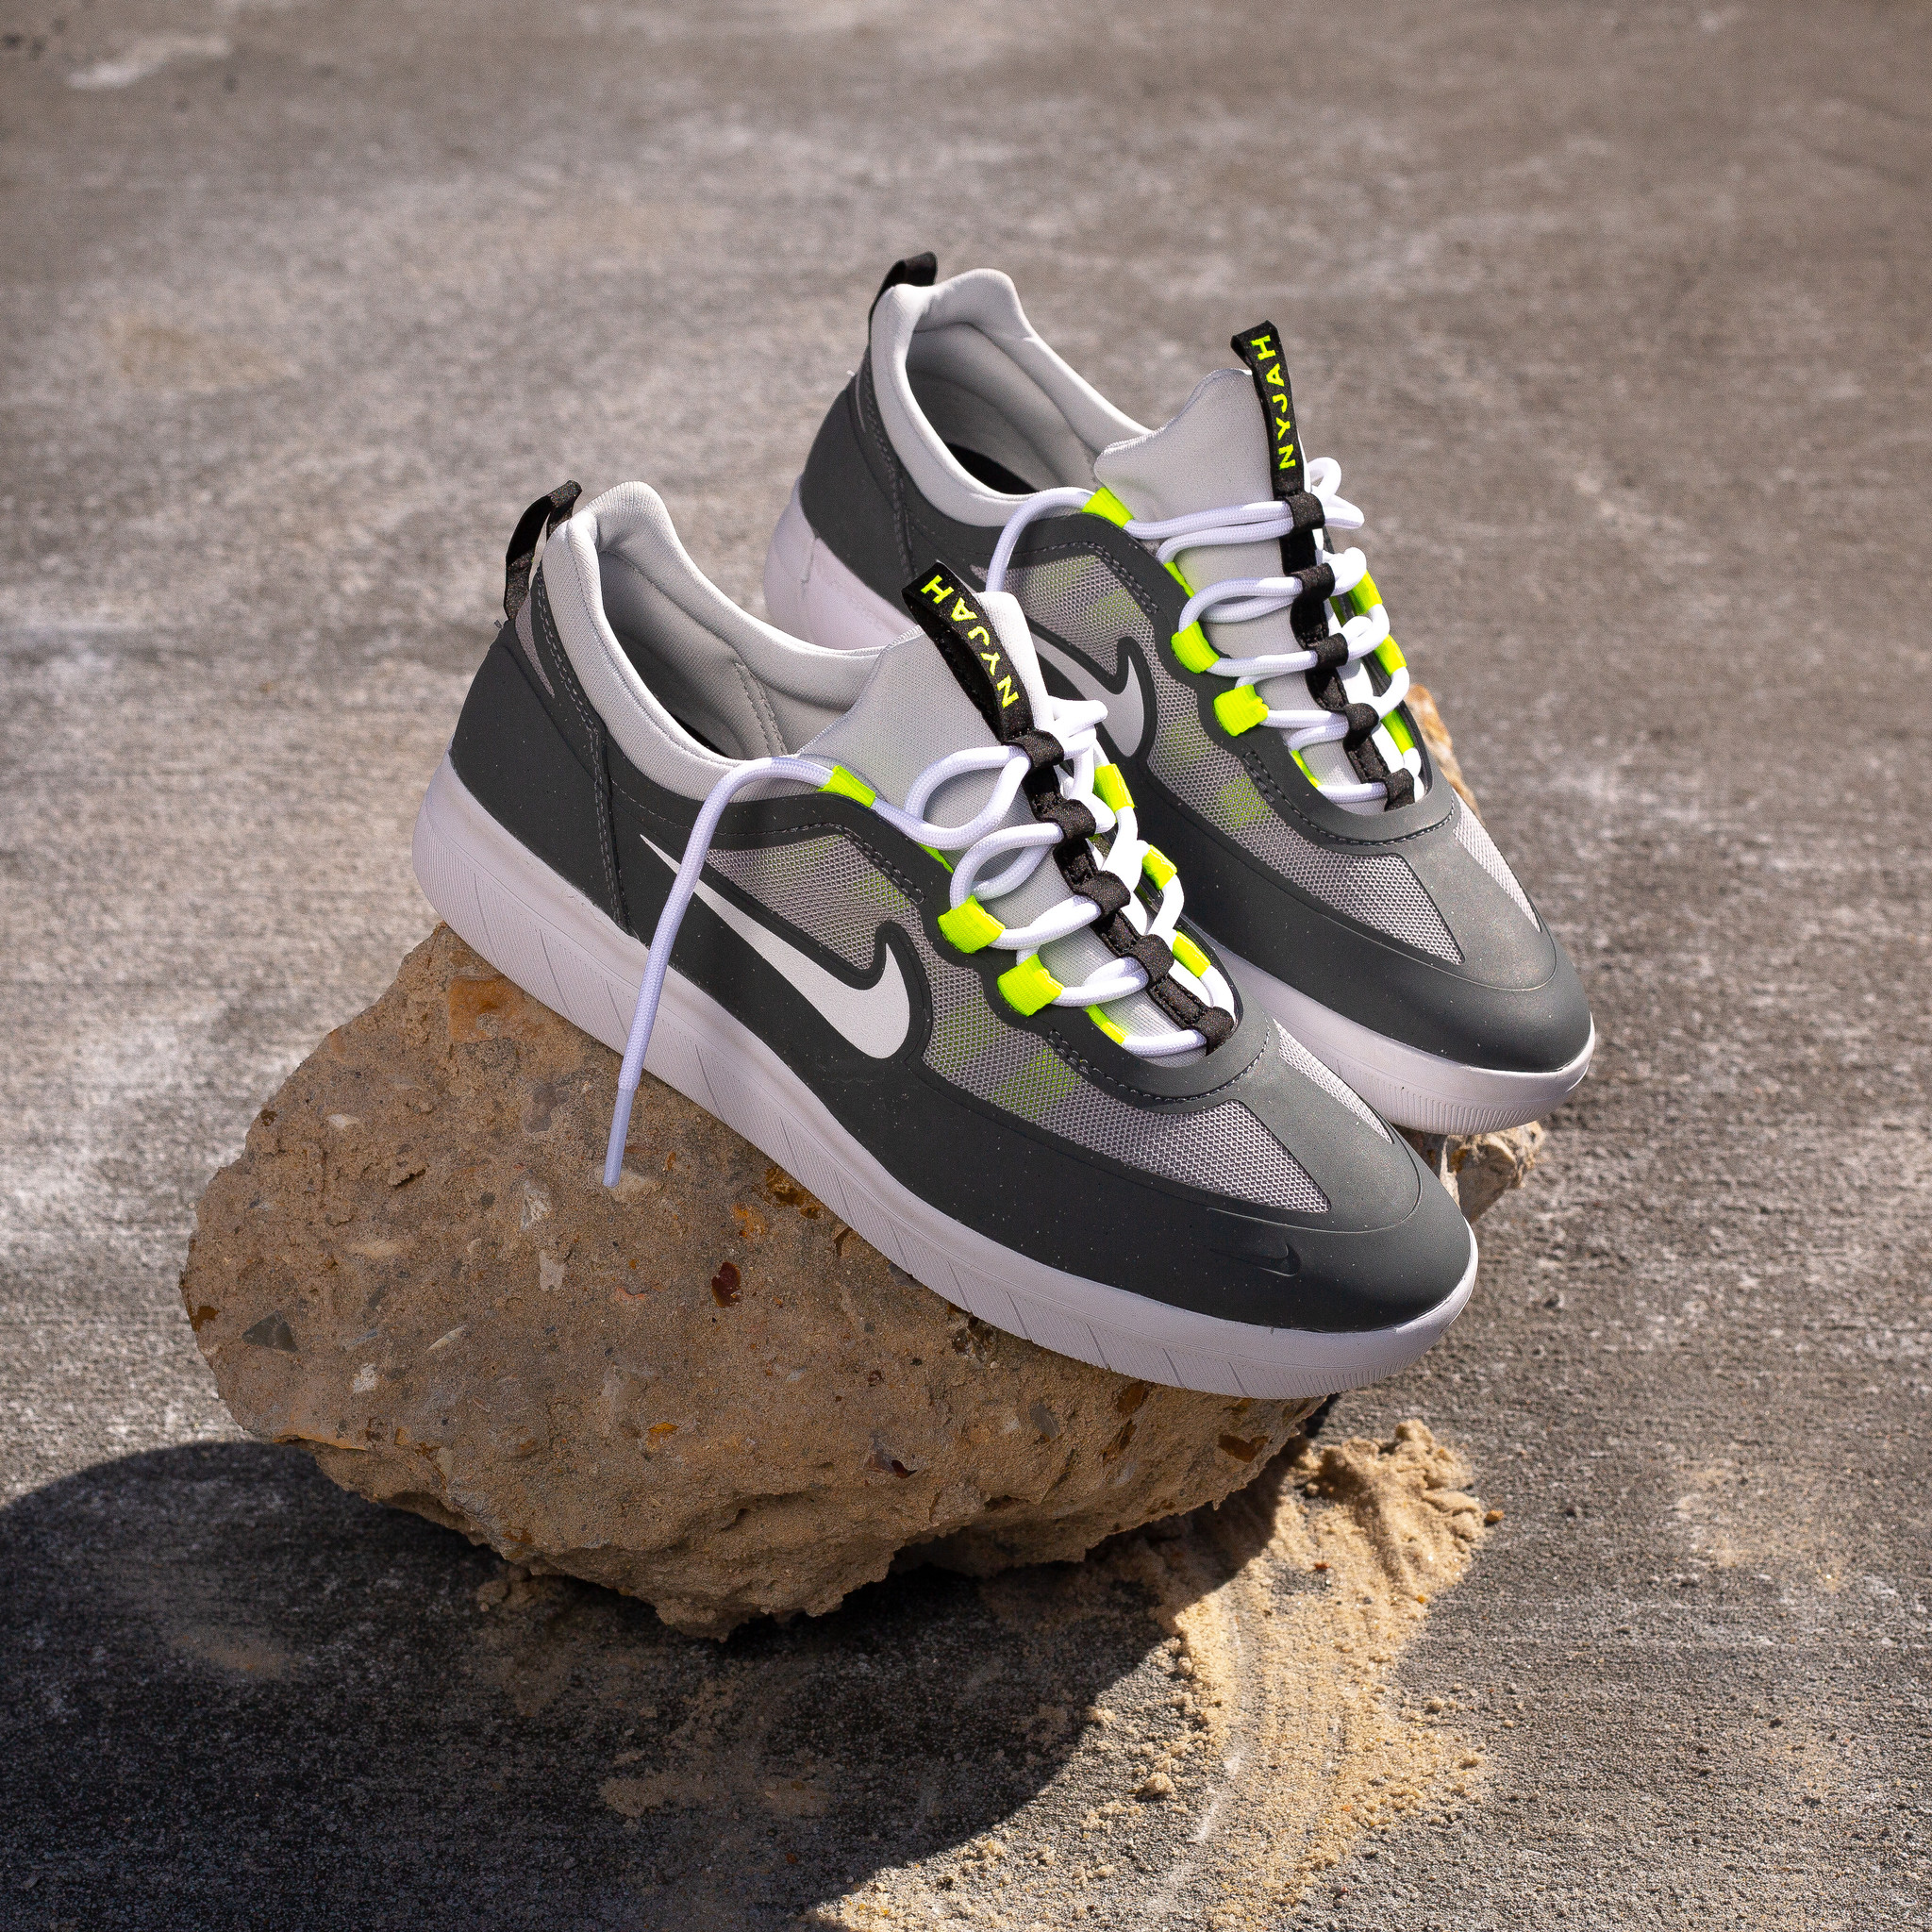 Nike SB Nyjah II Smoke Grey